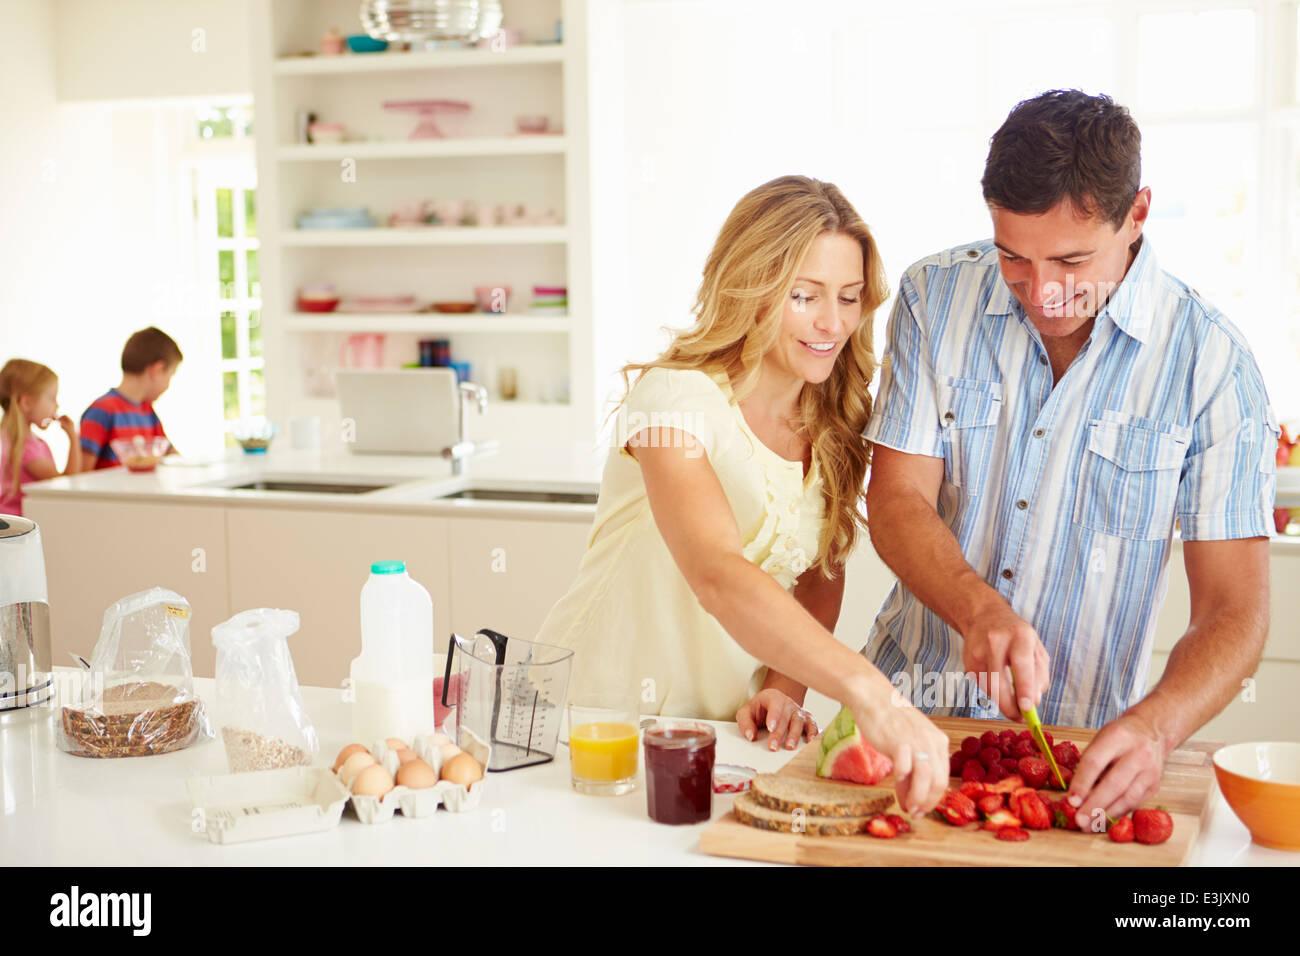 Parents Preparing Family Breakfast In Kitchen - Stock Image